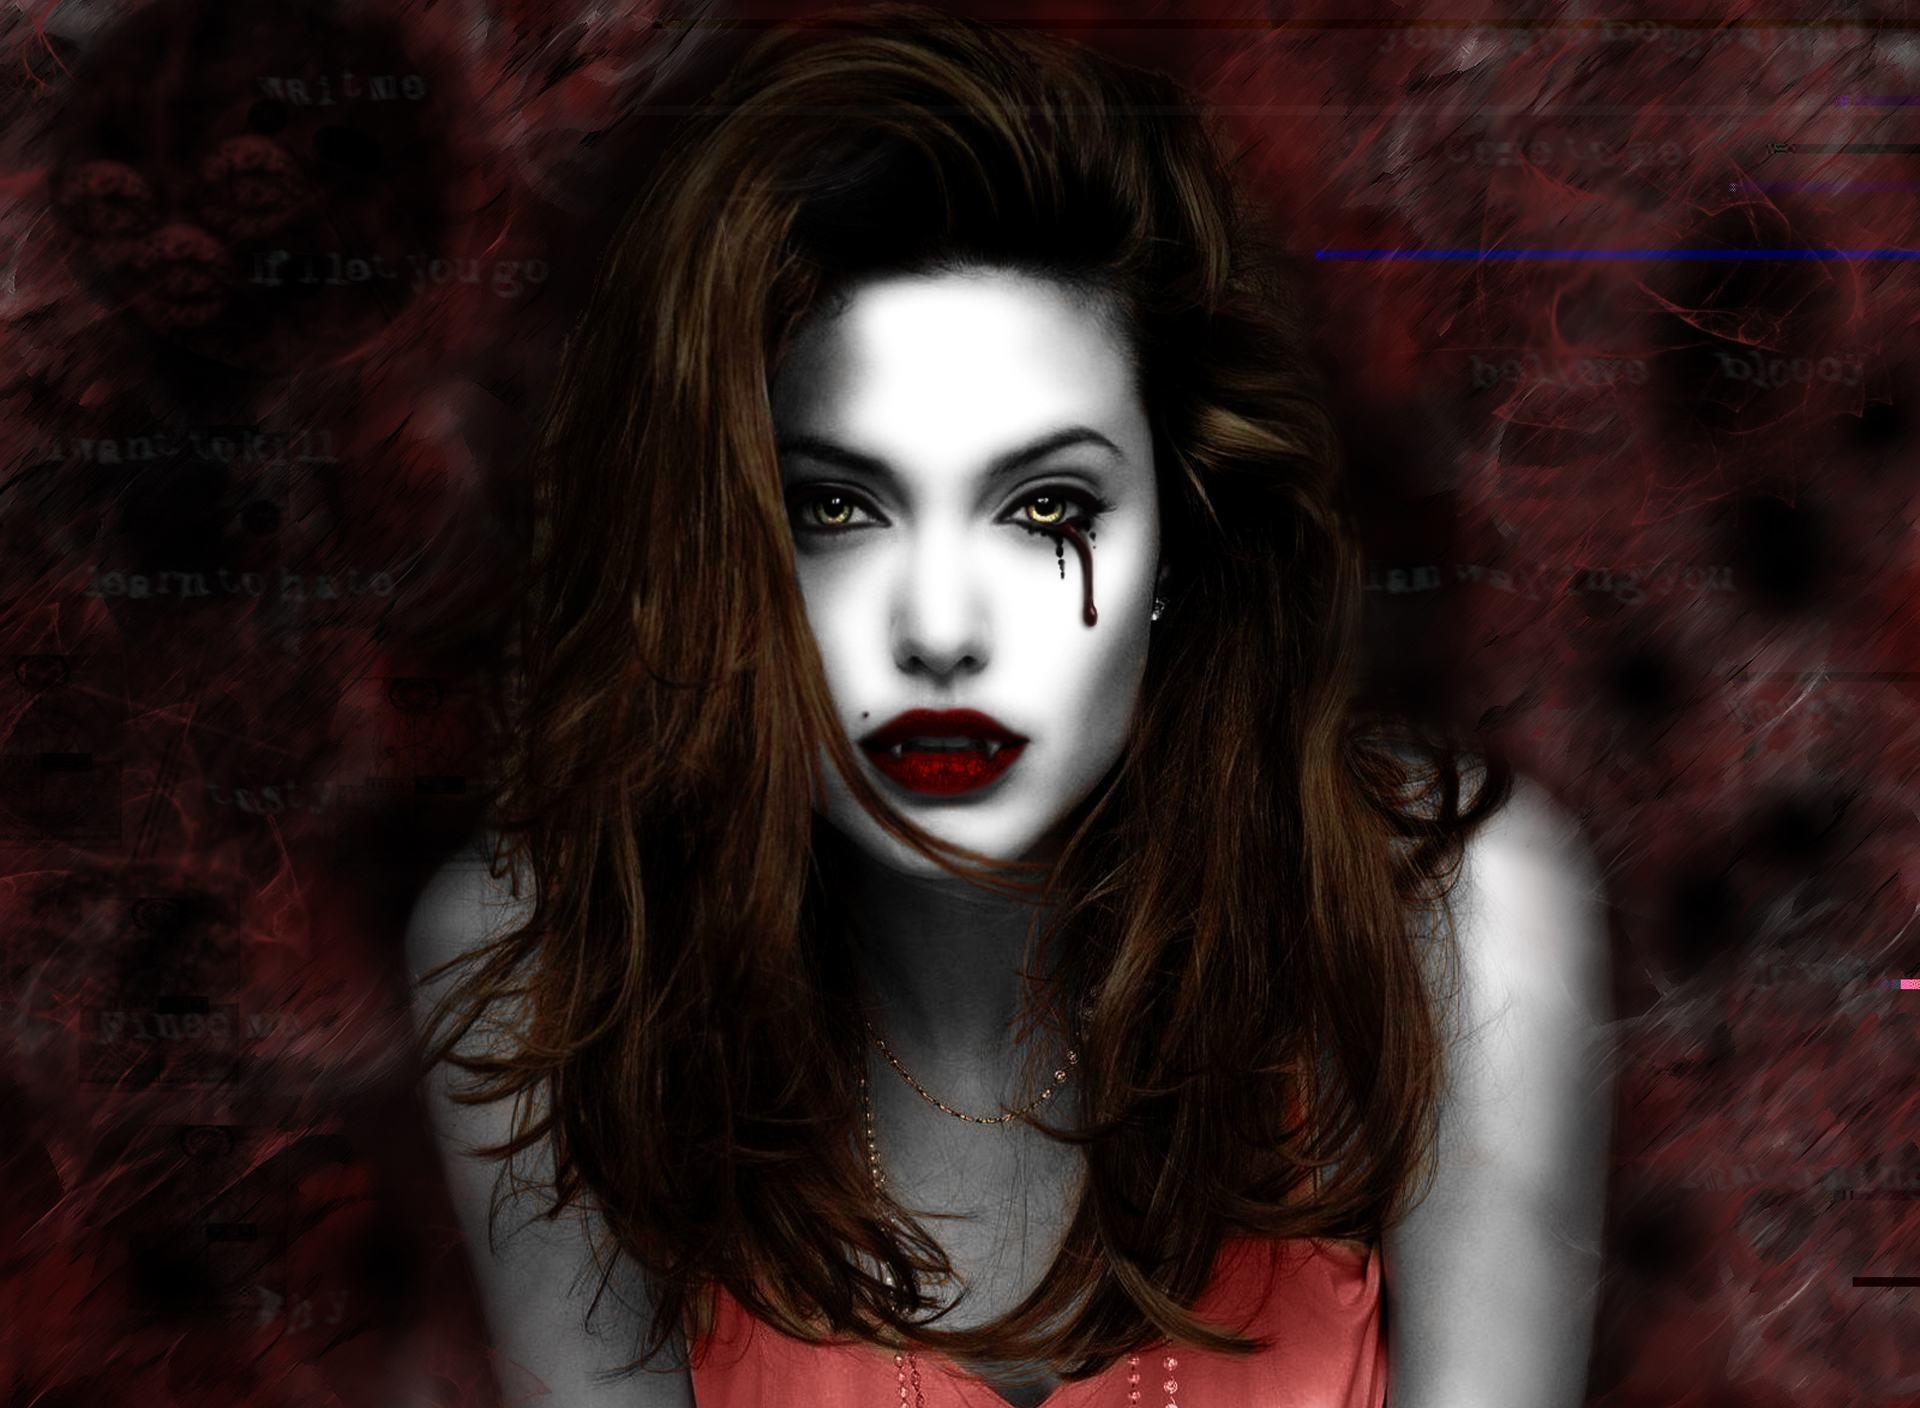 Fantasy Art Vampires Wallpapers Hd Desktop And Mobile: Female Vampire Wallpaper (67+ Images